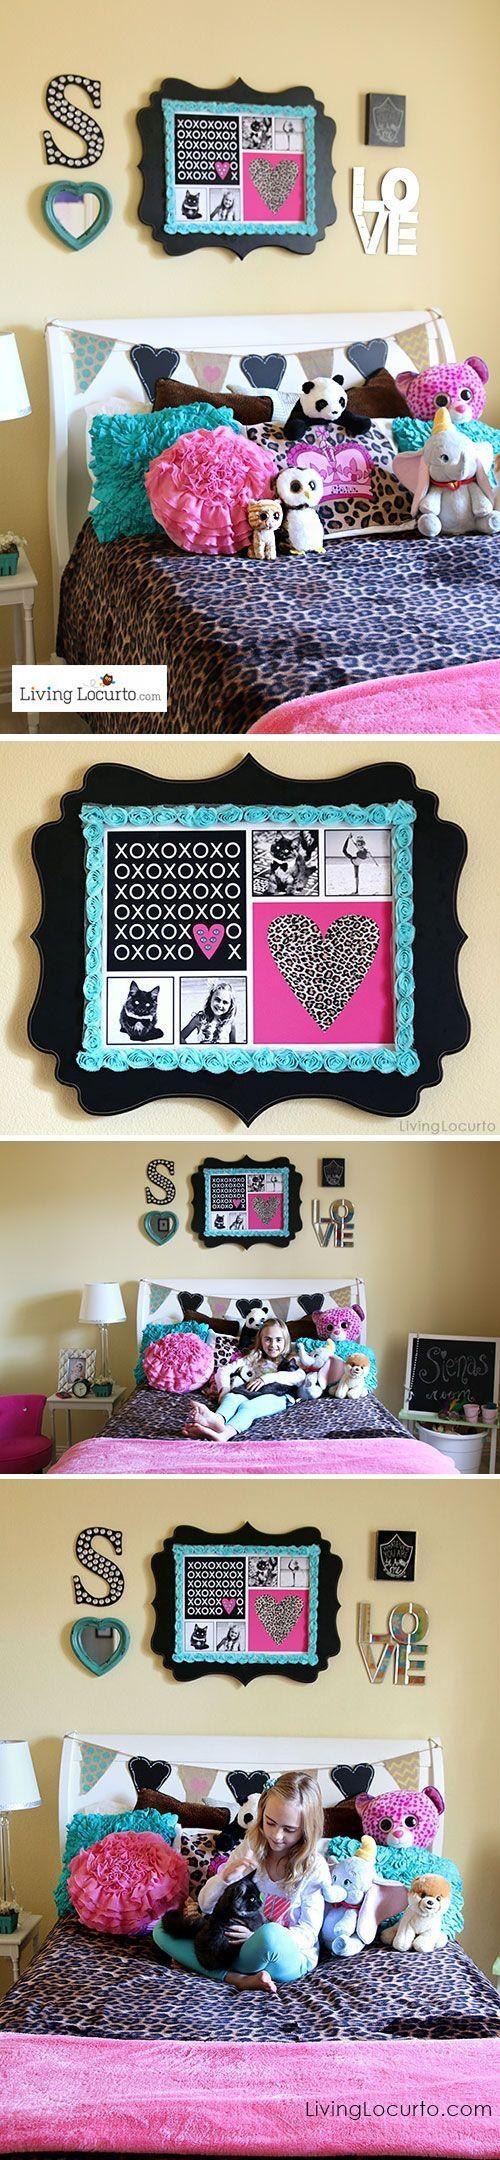 Best 25+ Girls Bedroom Decorating Ideas On Pinterest | Girls Intended For Inspirational Wall Art For Girls (Image 5 of 20)